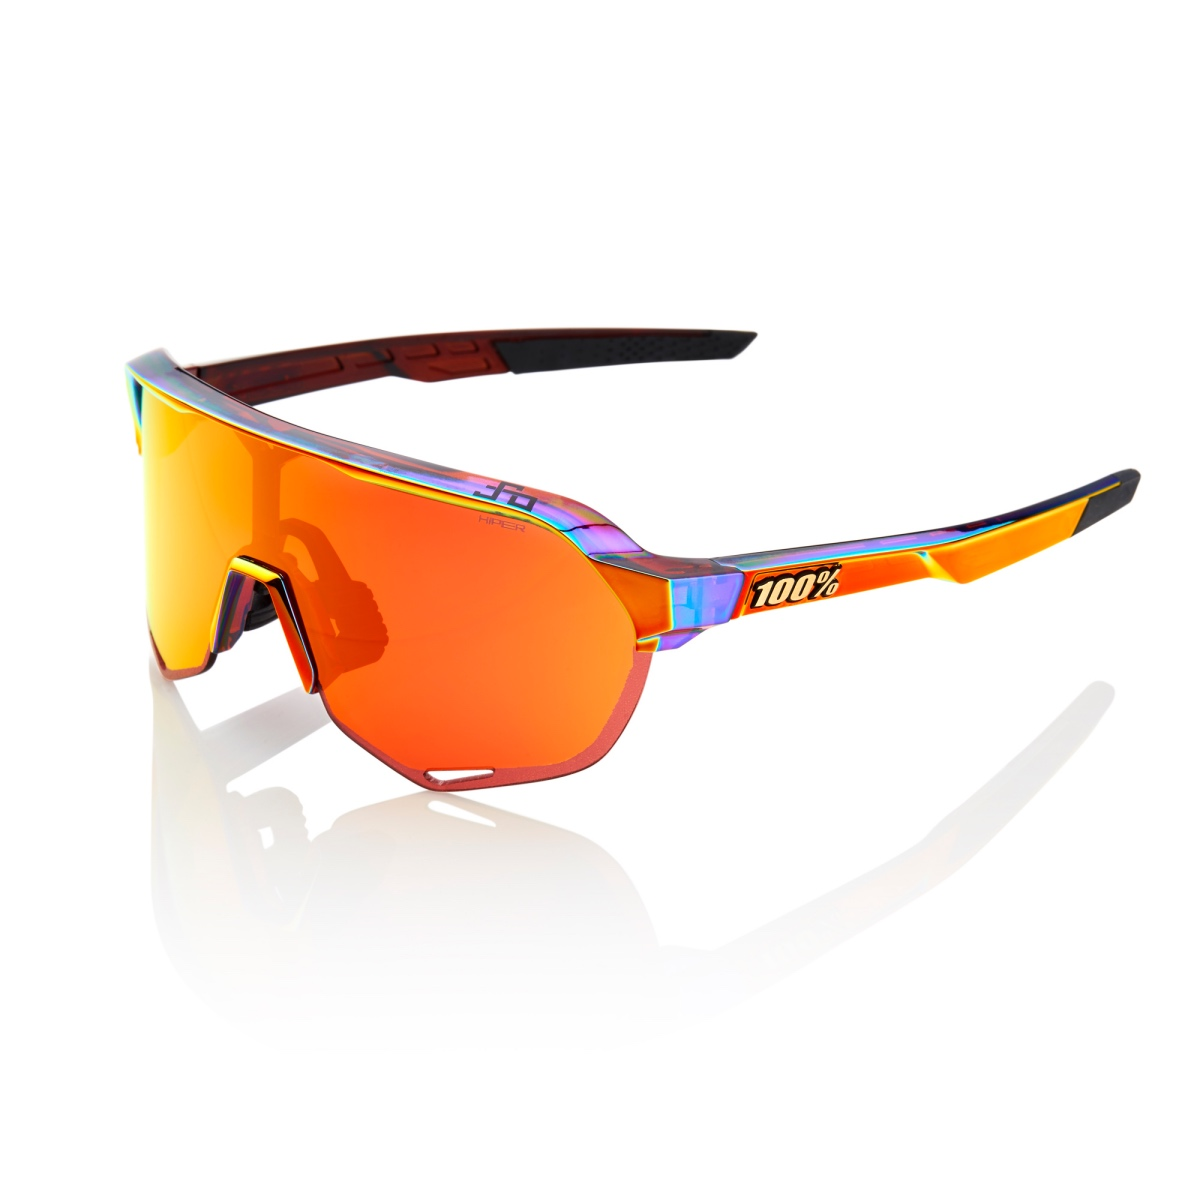 100% Limited Edition Peter Sagan S2 sunglasses.